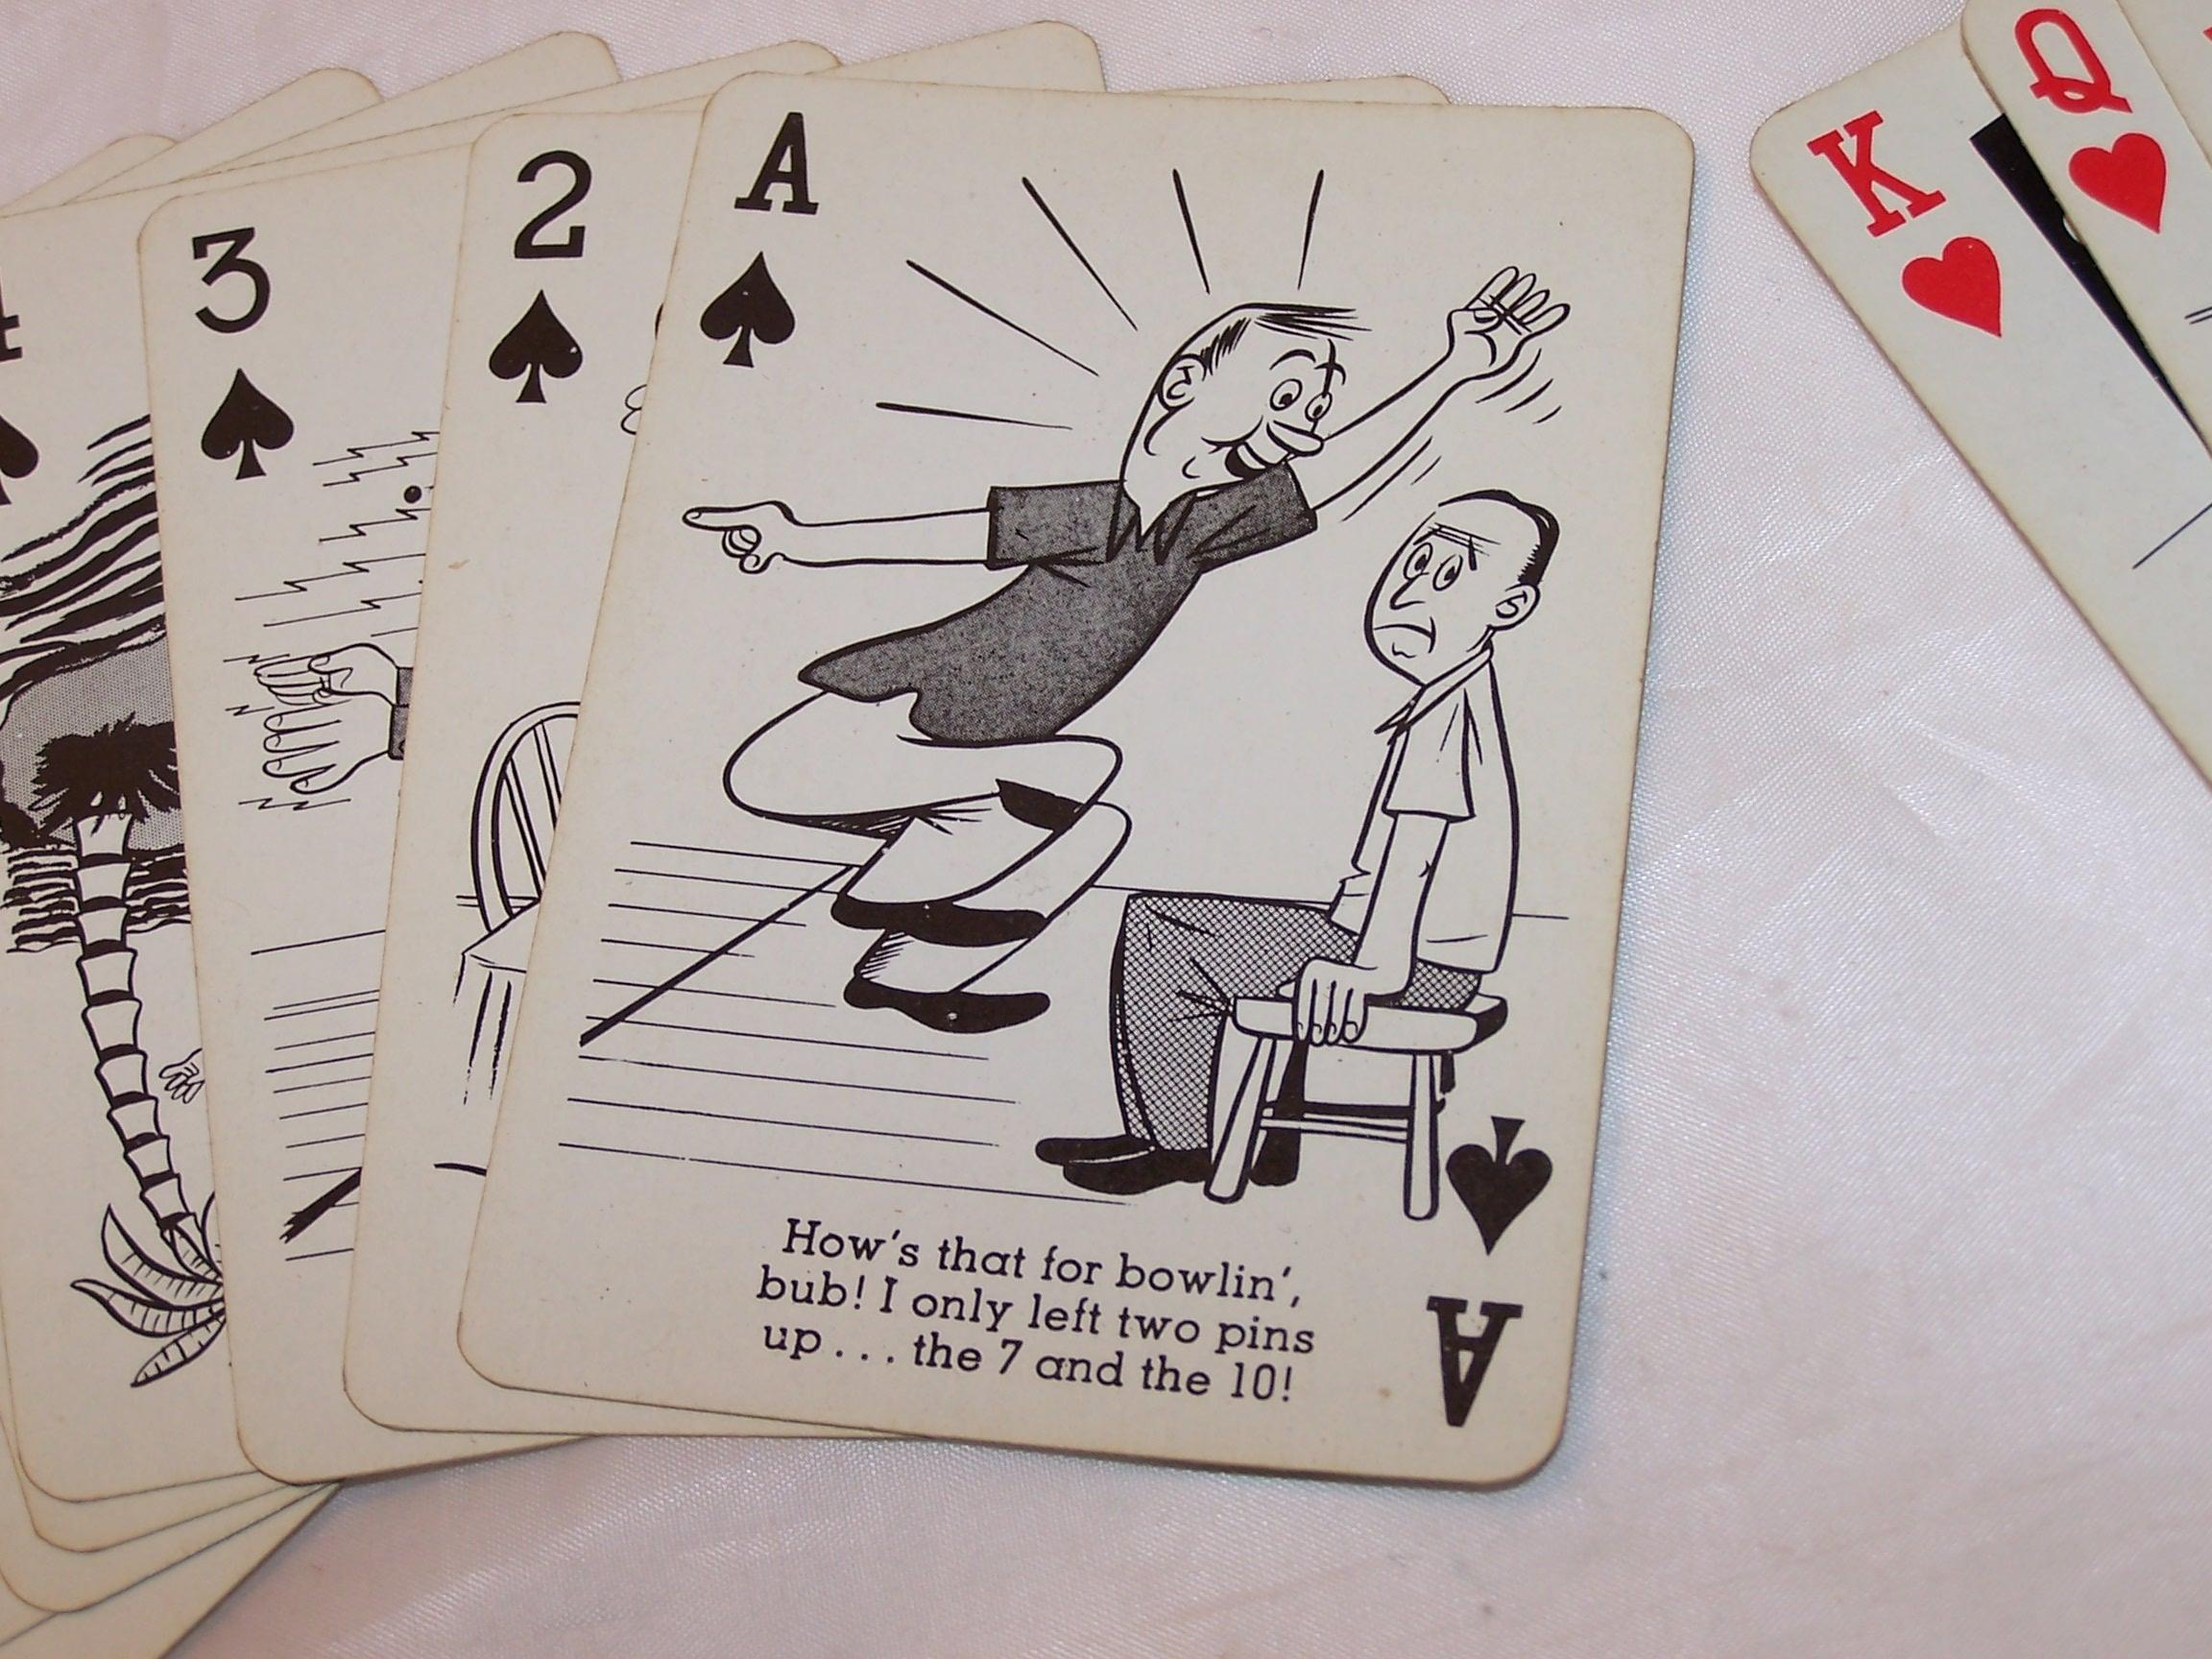 Image 3 of Playing Cards Bowling Jokes, Poker Size, Vntg Orig Pkg